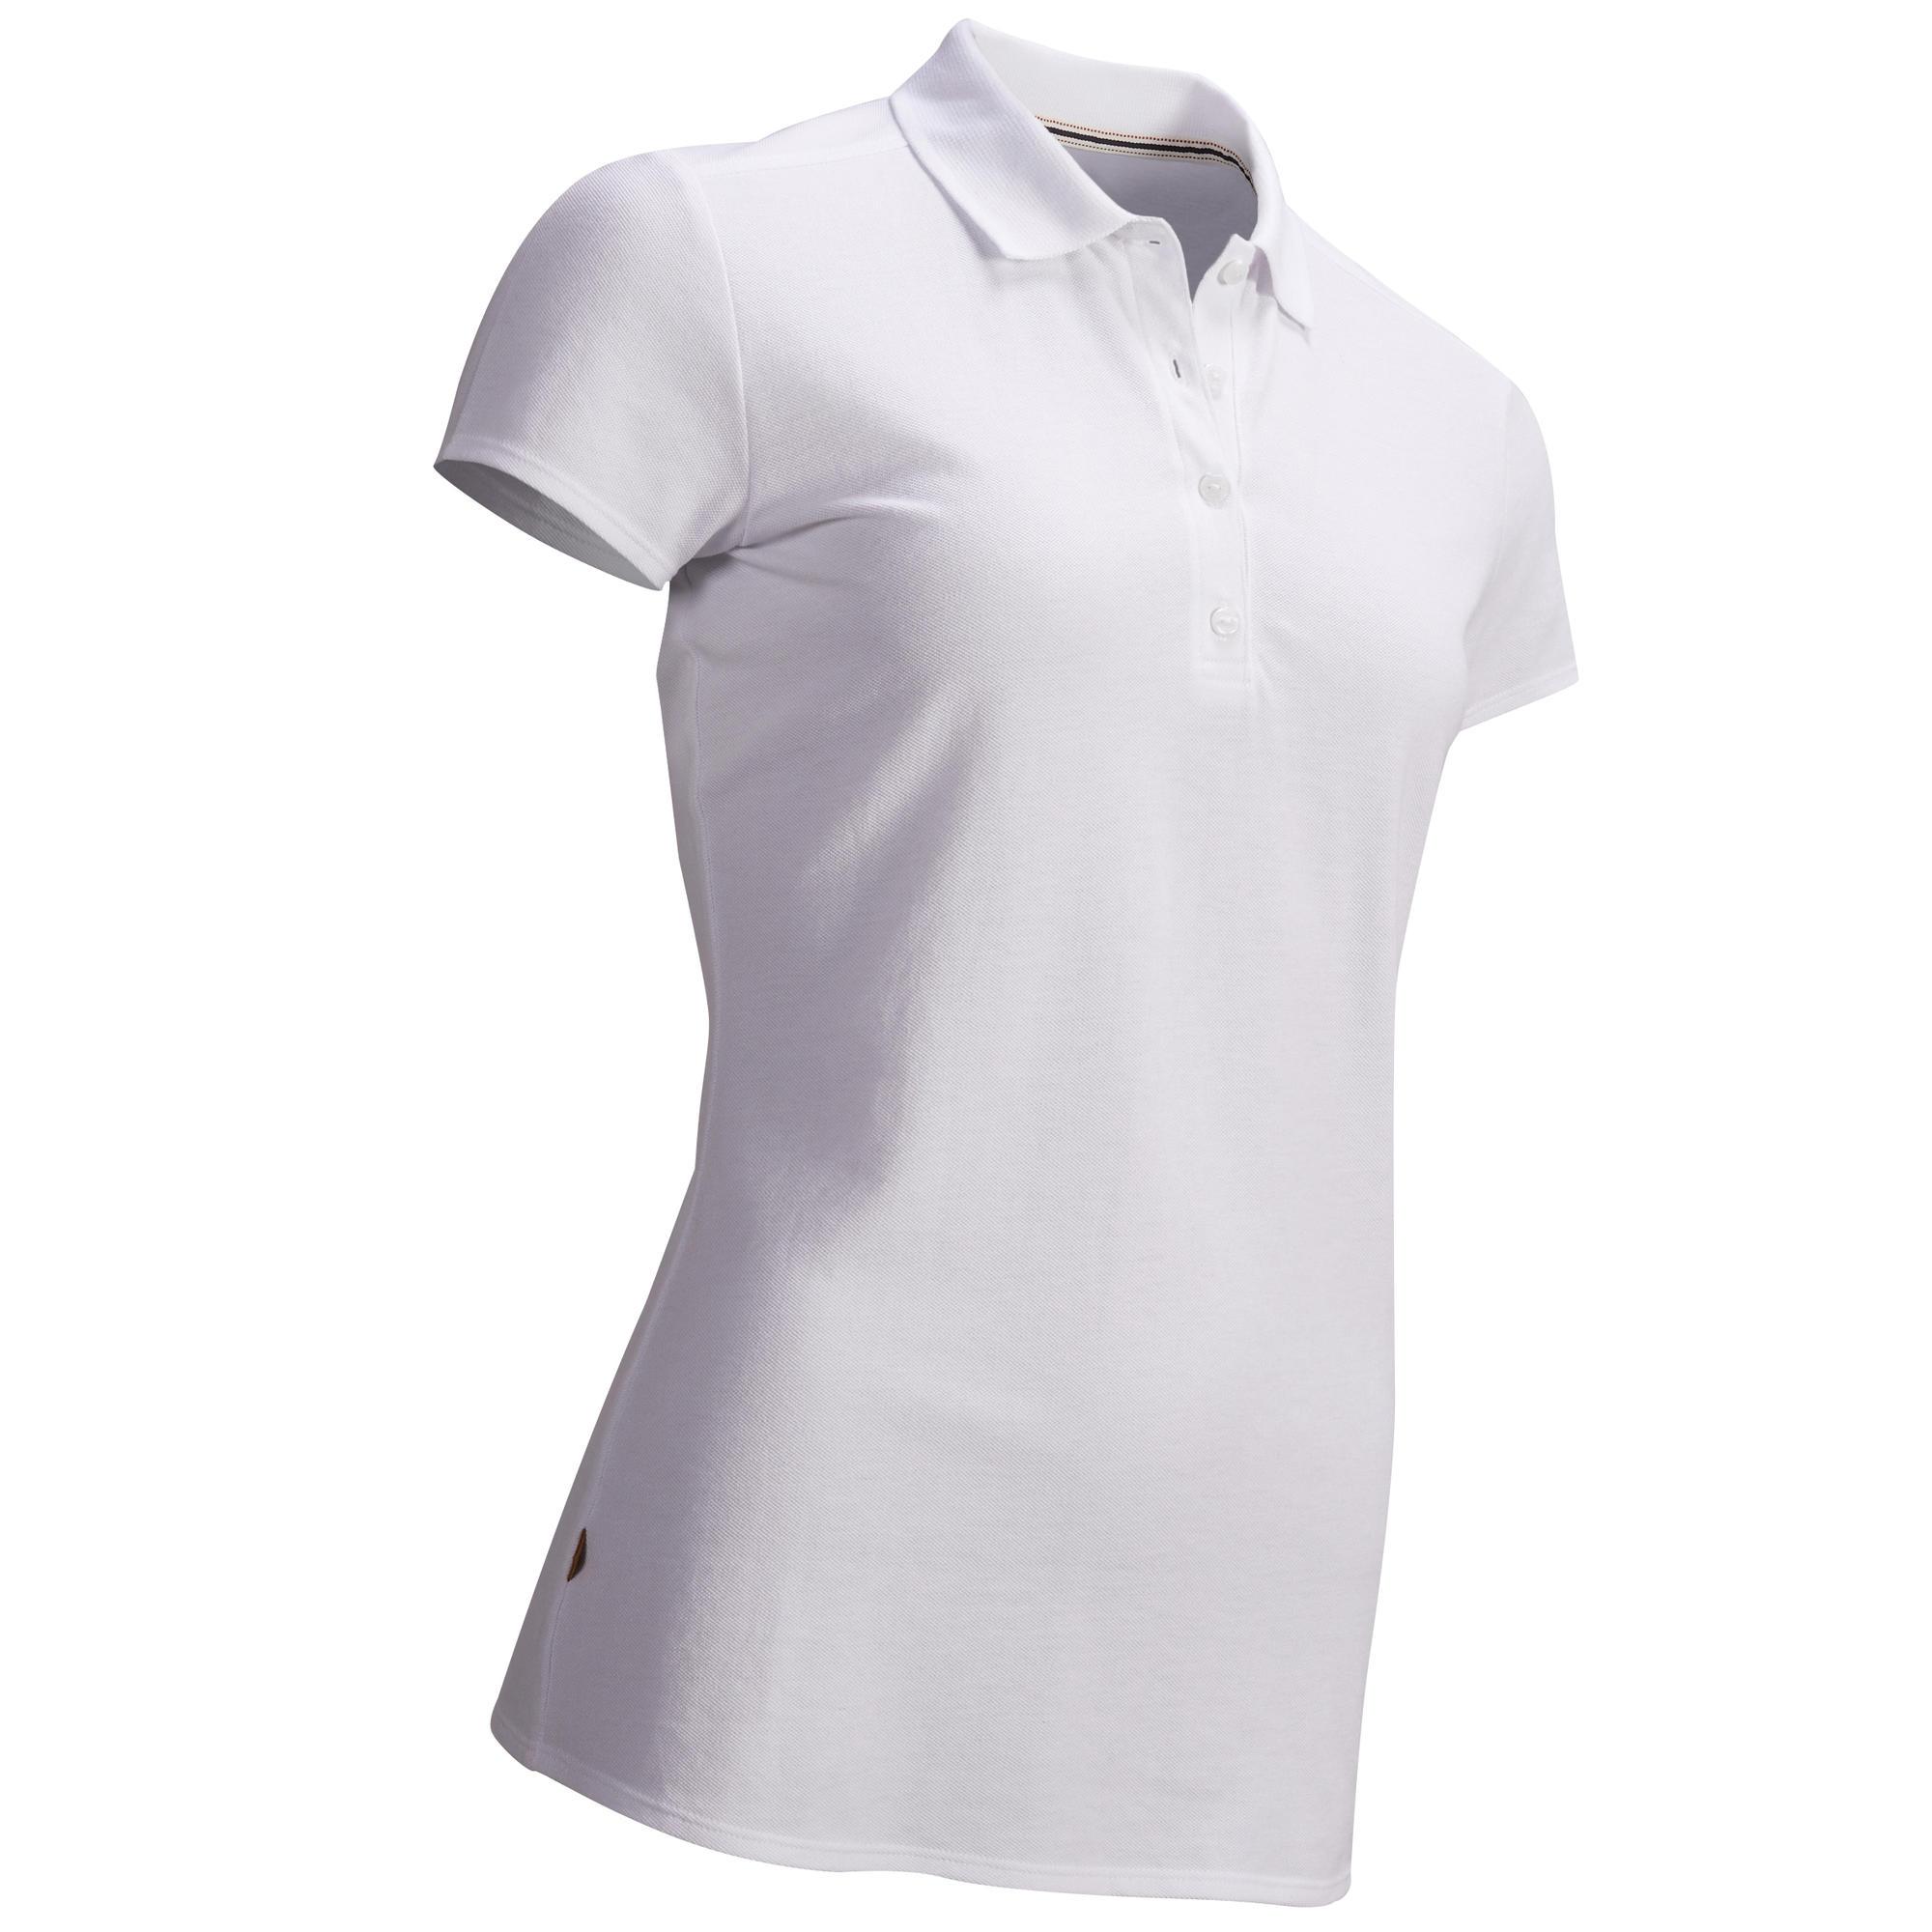 polo de golf manche courte femme temps tempere blanc inesis golf. Black Bedroom Furniture Sets. Home Design Ideas